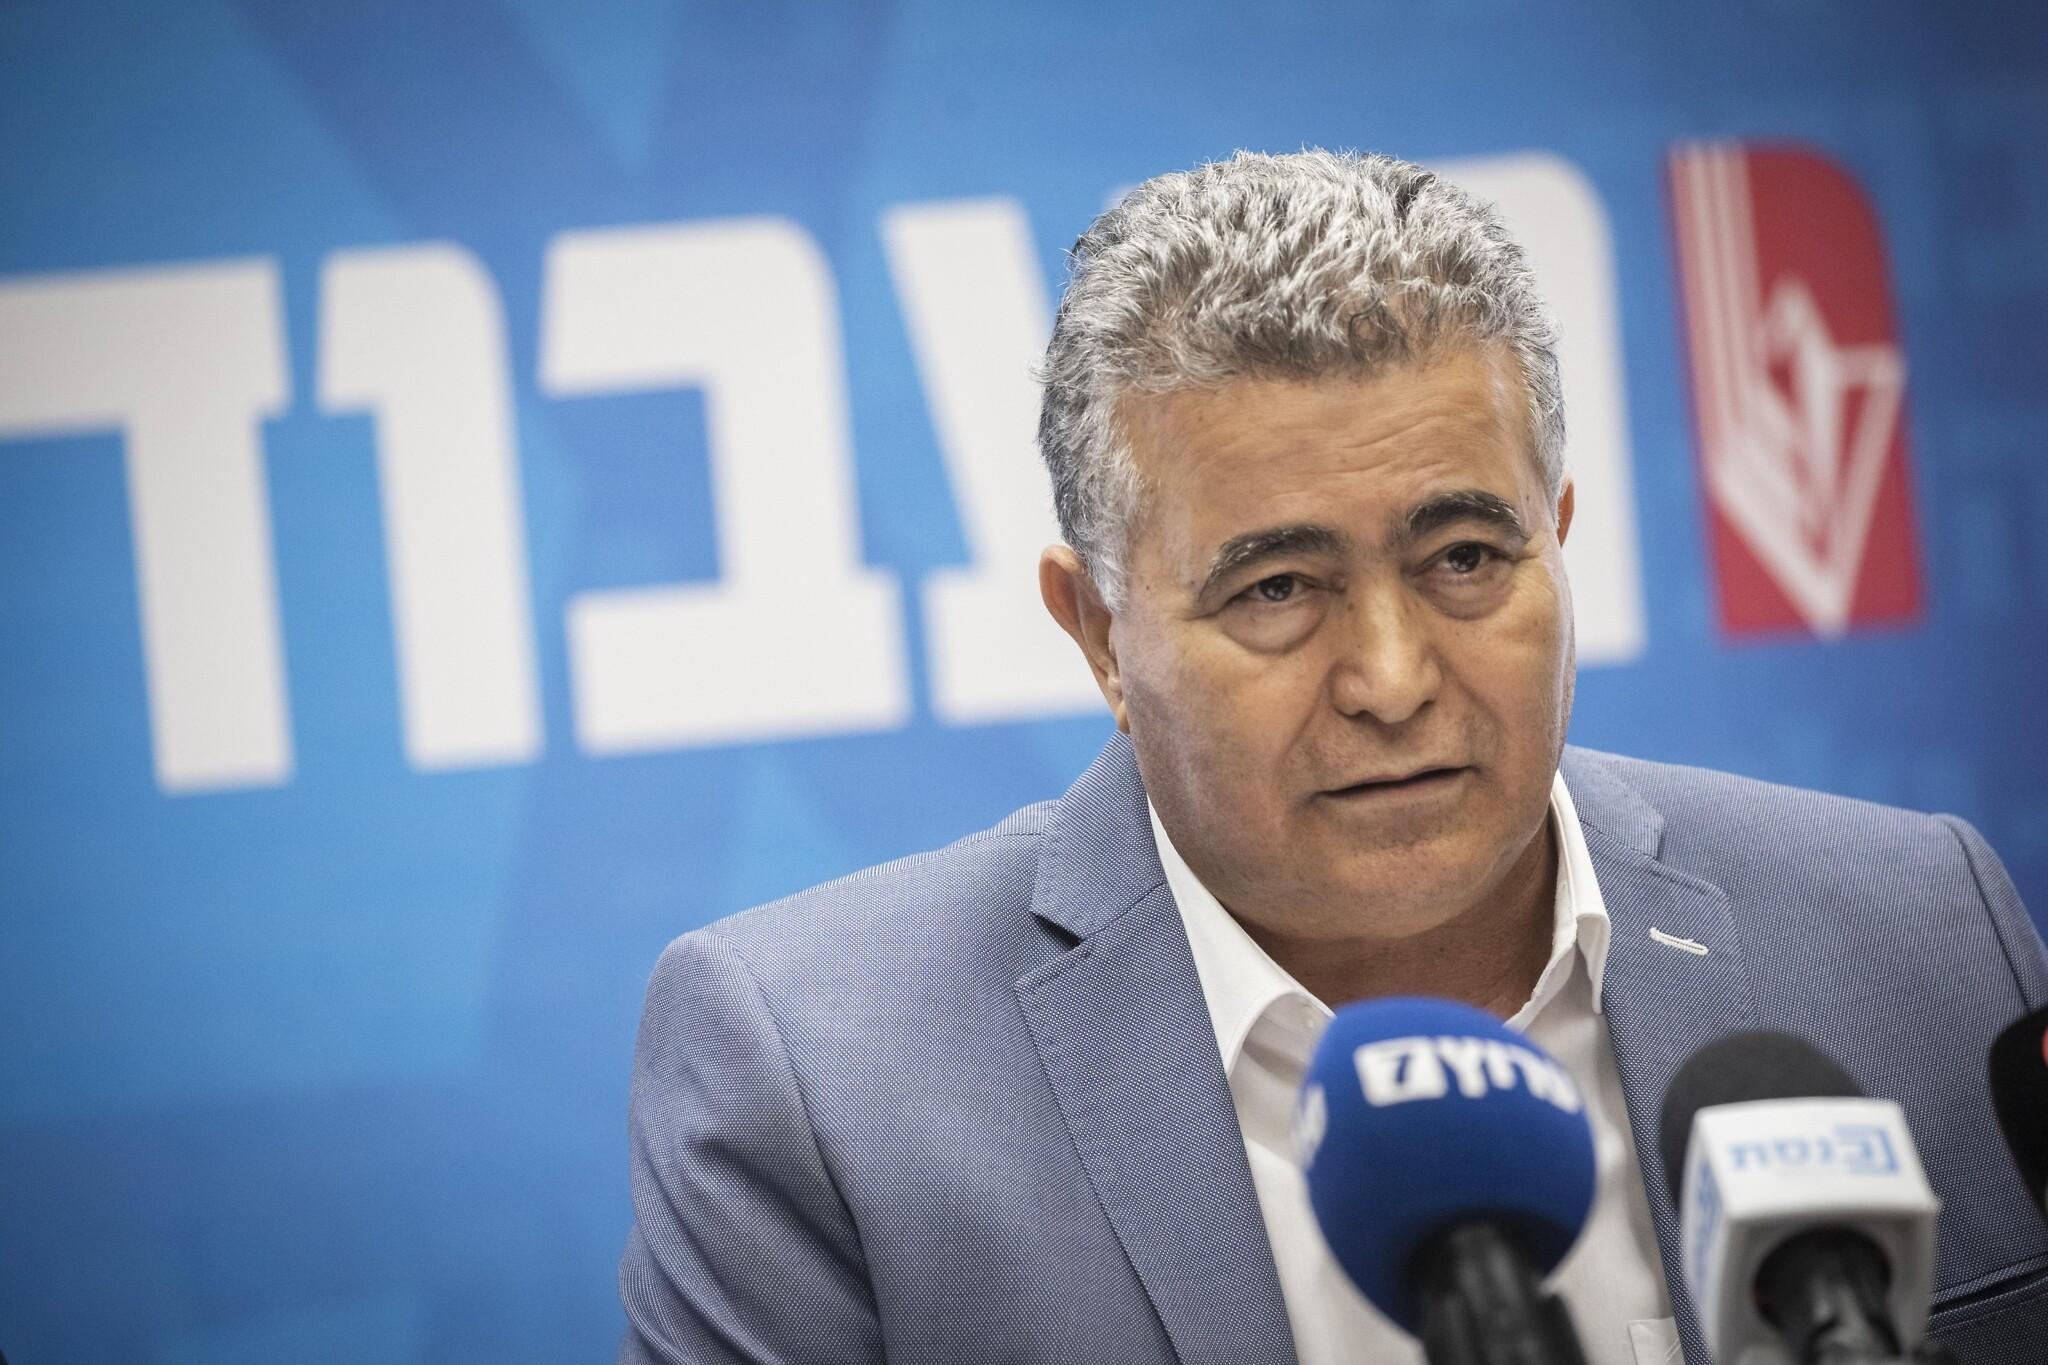 Le Premier ministre israélien Benyamin Netanyahu mis en examen